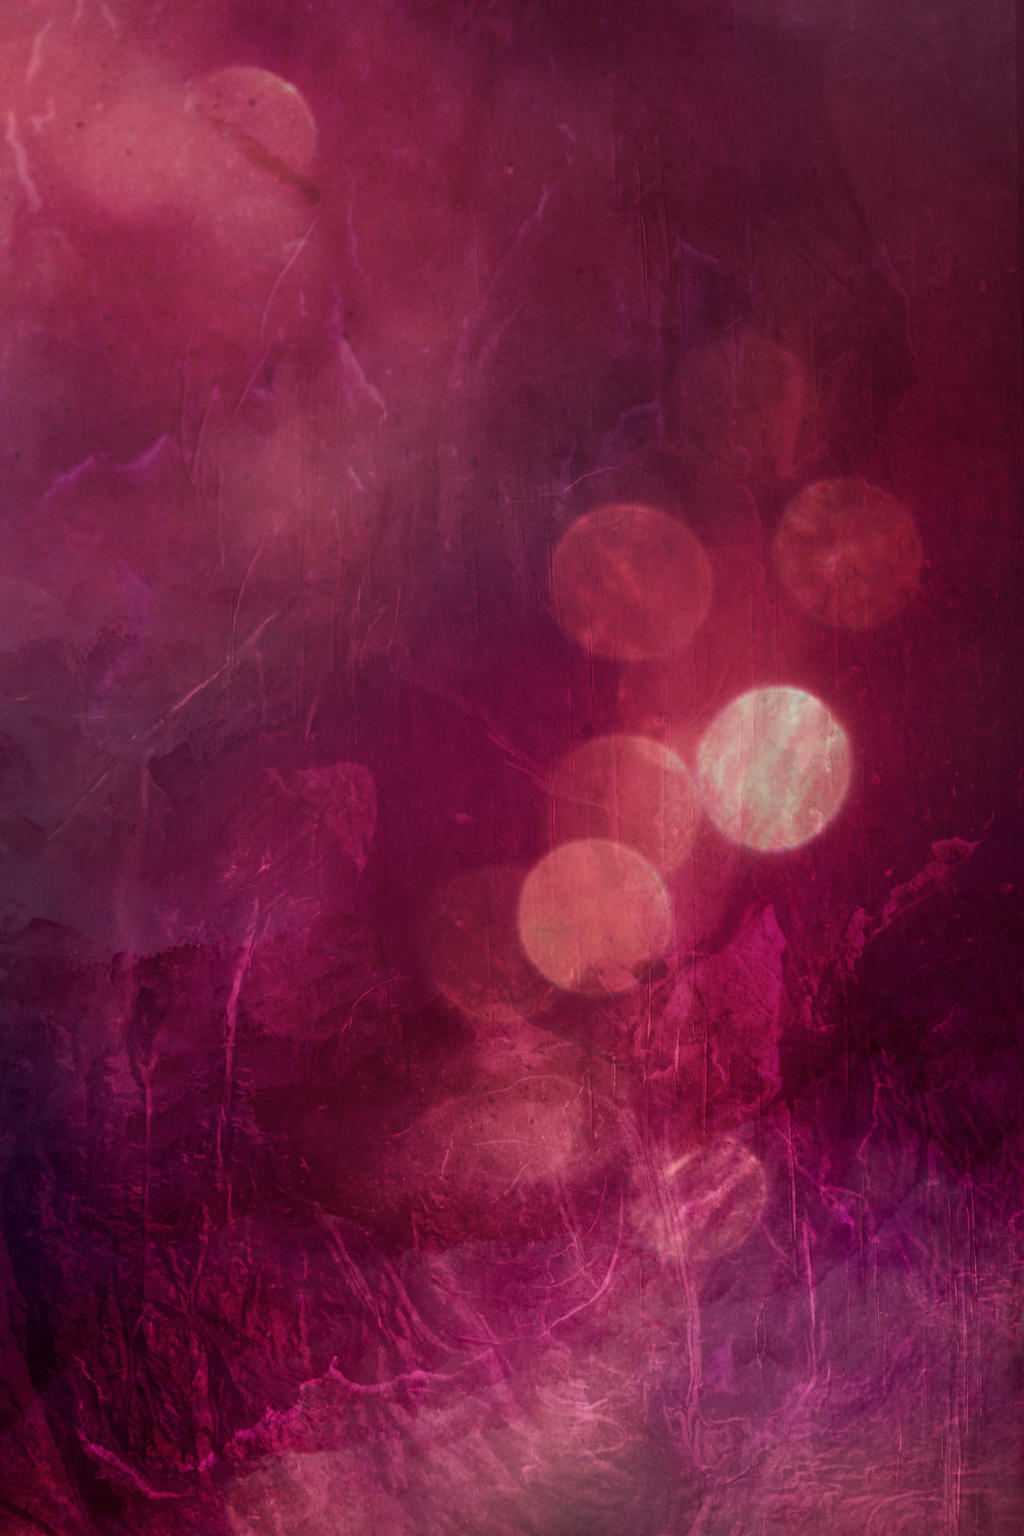 Digital Art Texture 106 by mercurycode